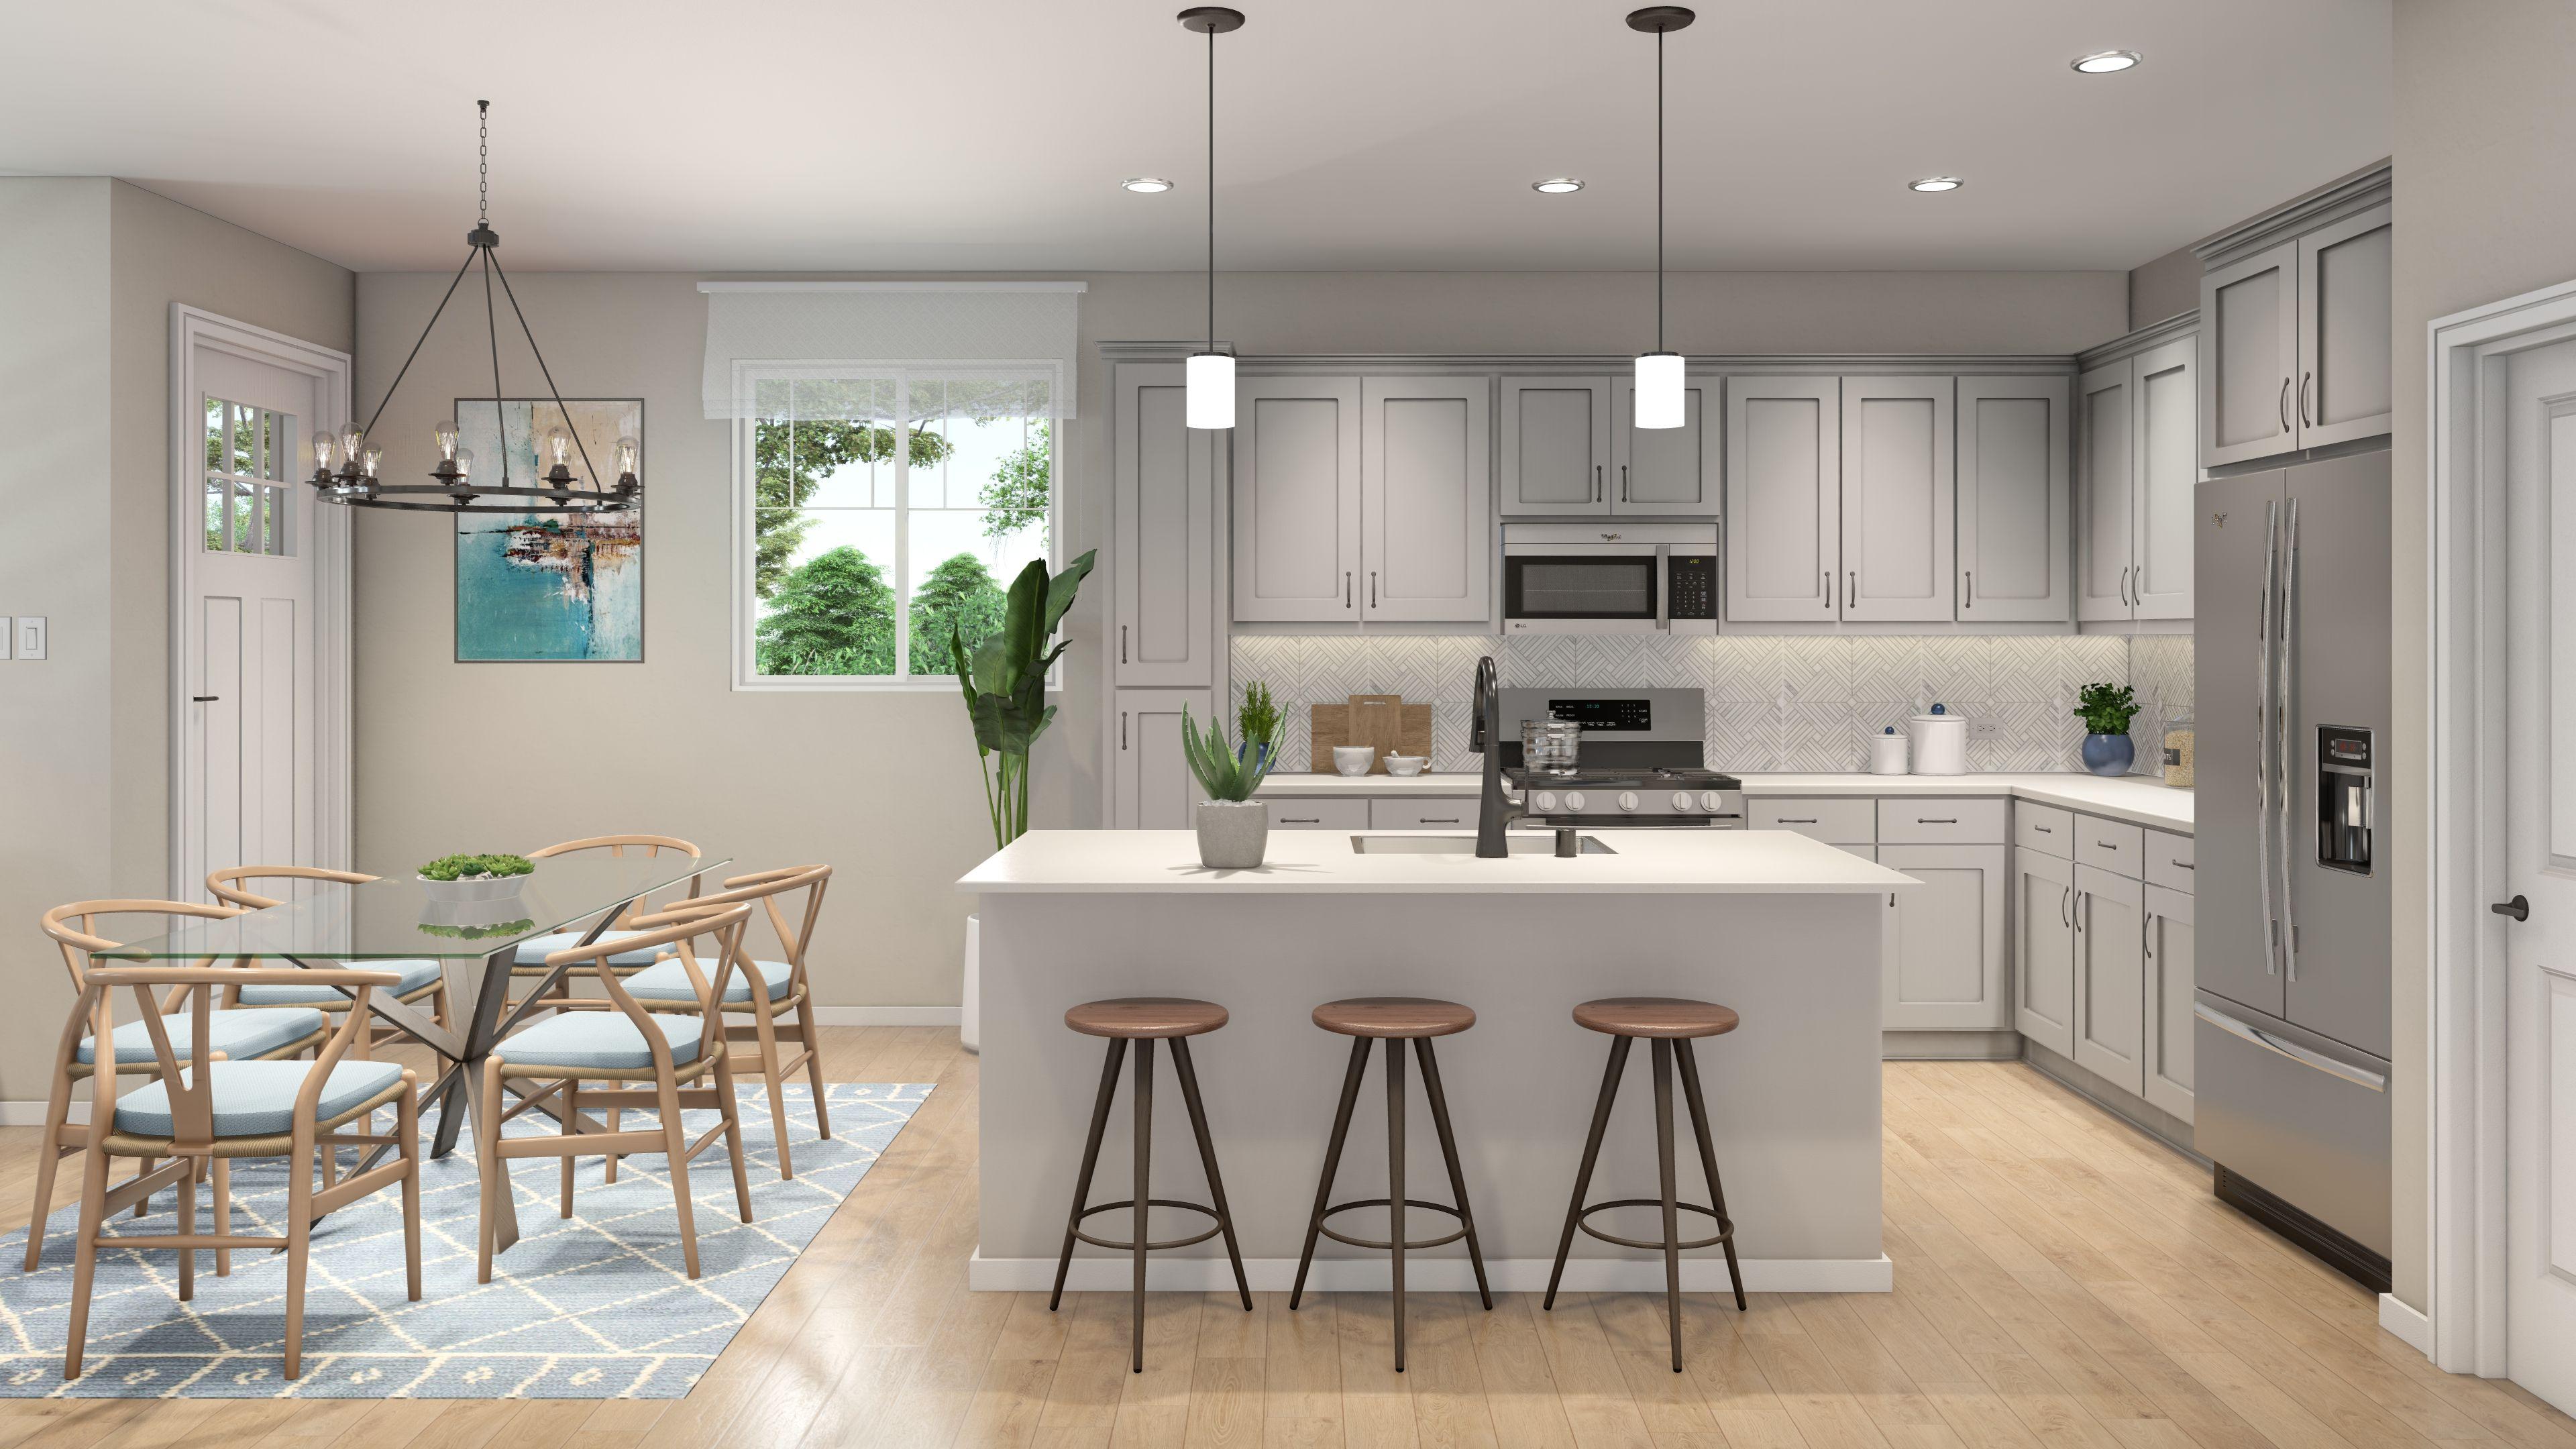 Kitchen featured in the Plan 1 By R at Righetti in San Luis Obispo, CA